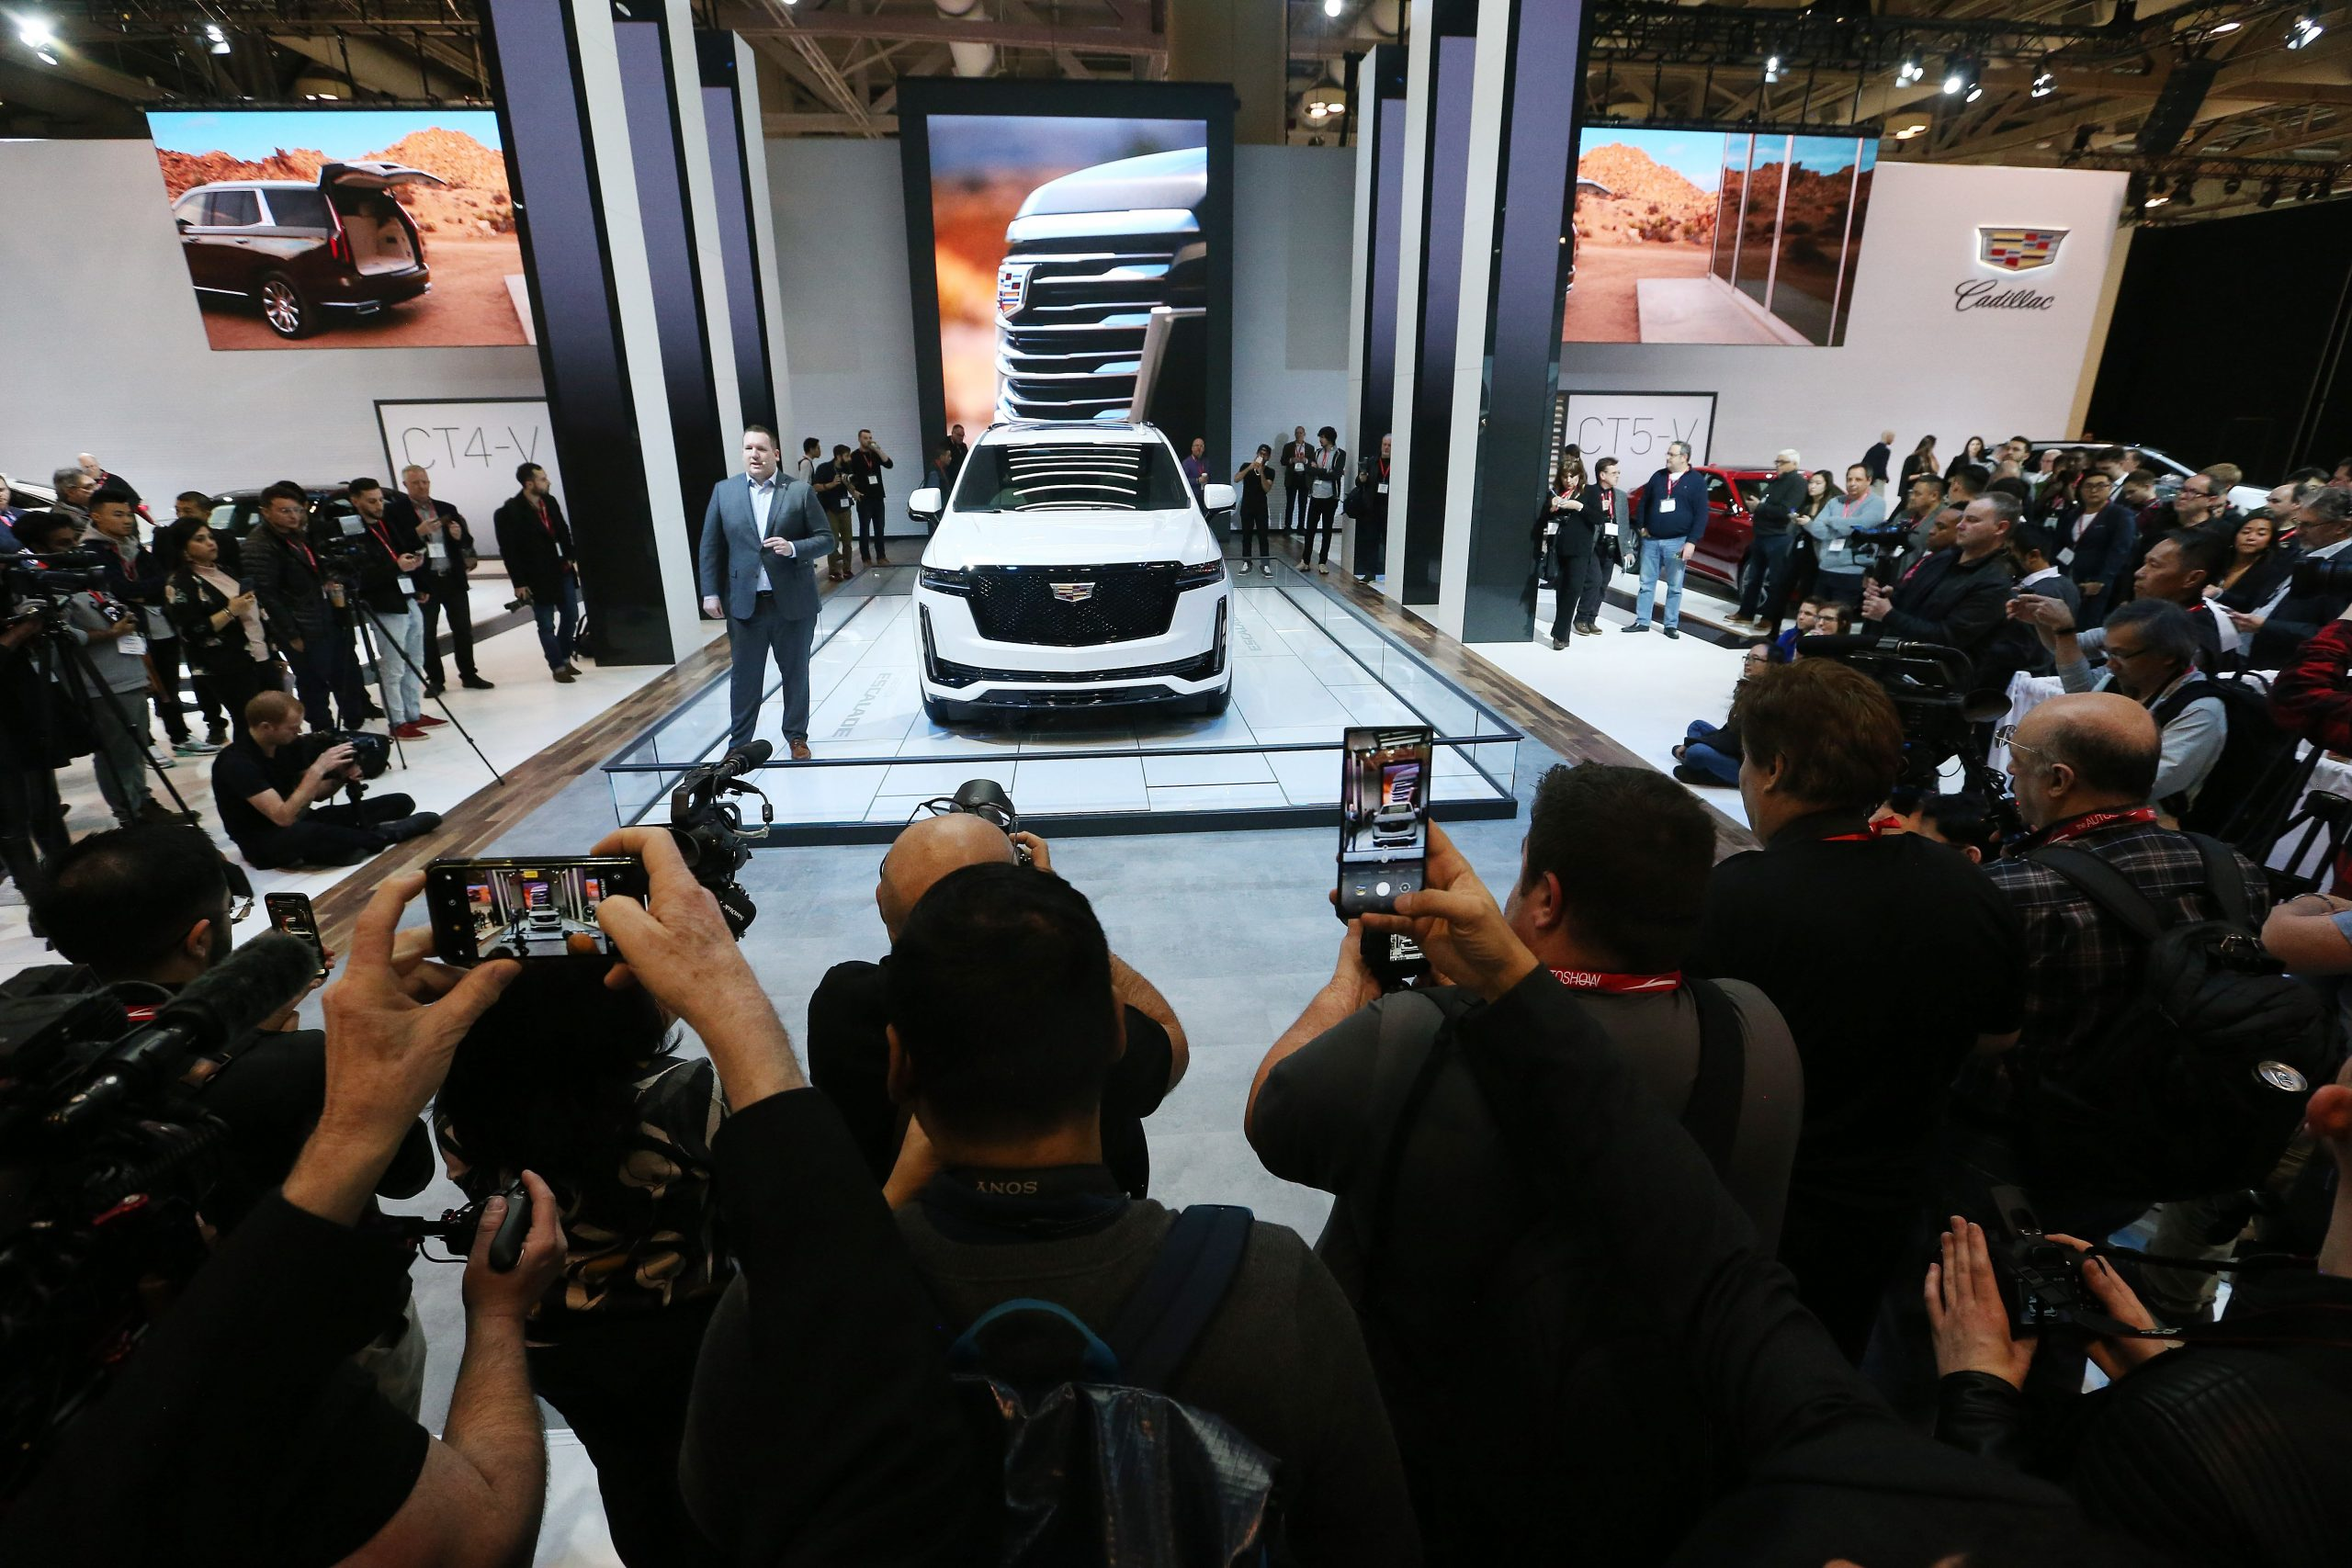 The AutoShow CIAS 2021